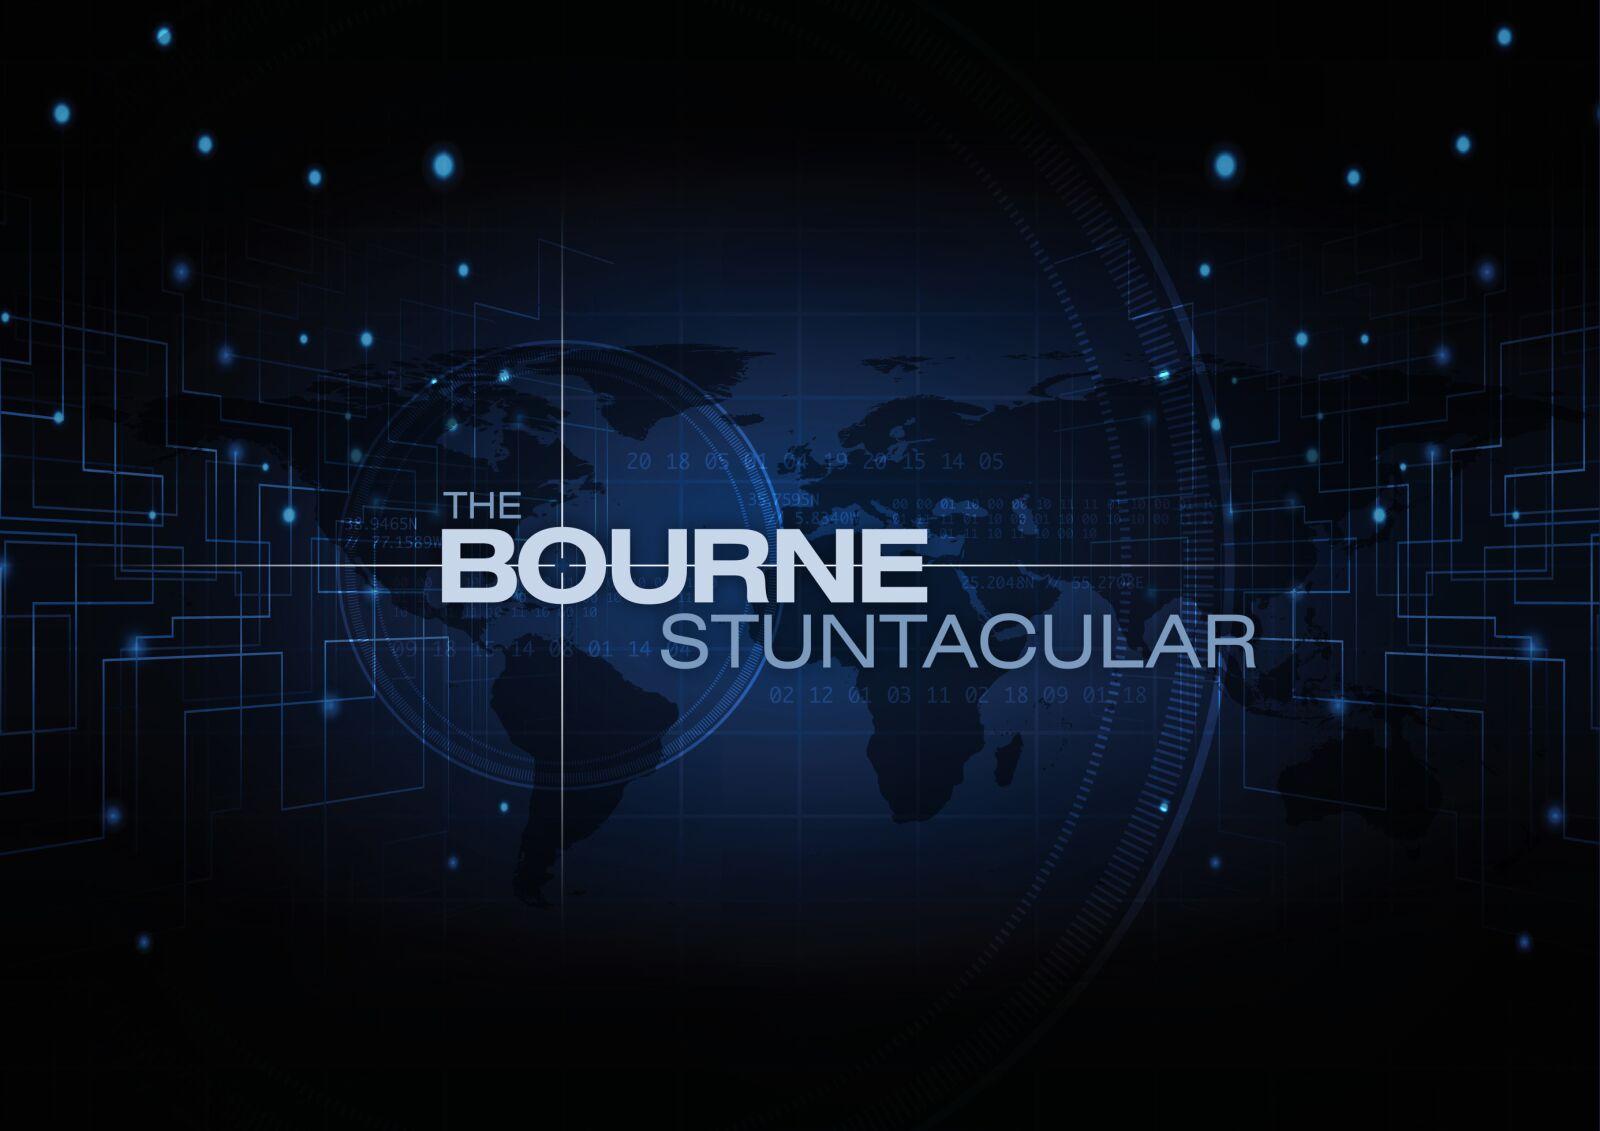 The Bourne Stuntacular brings the Bourne franchise to Universal Orlando Resort